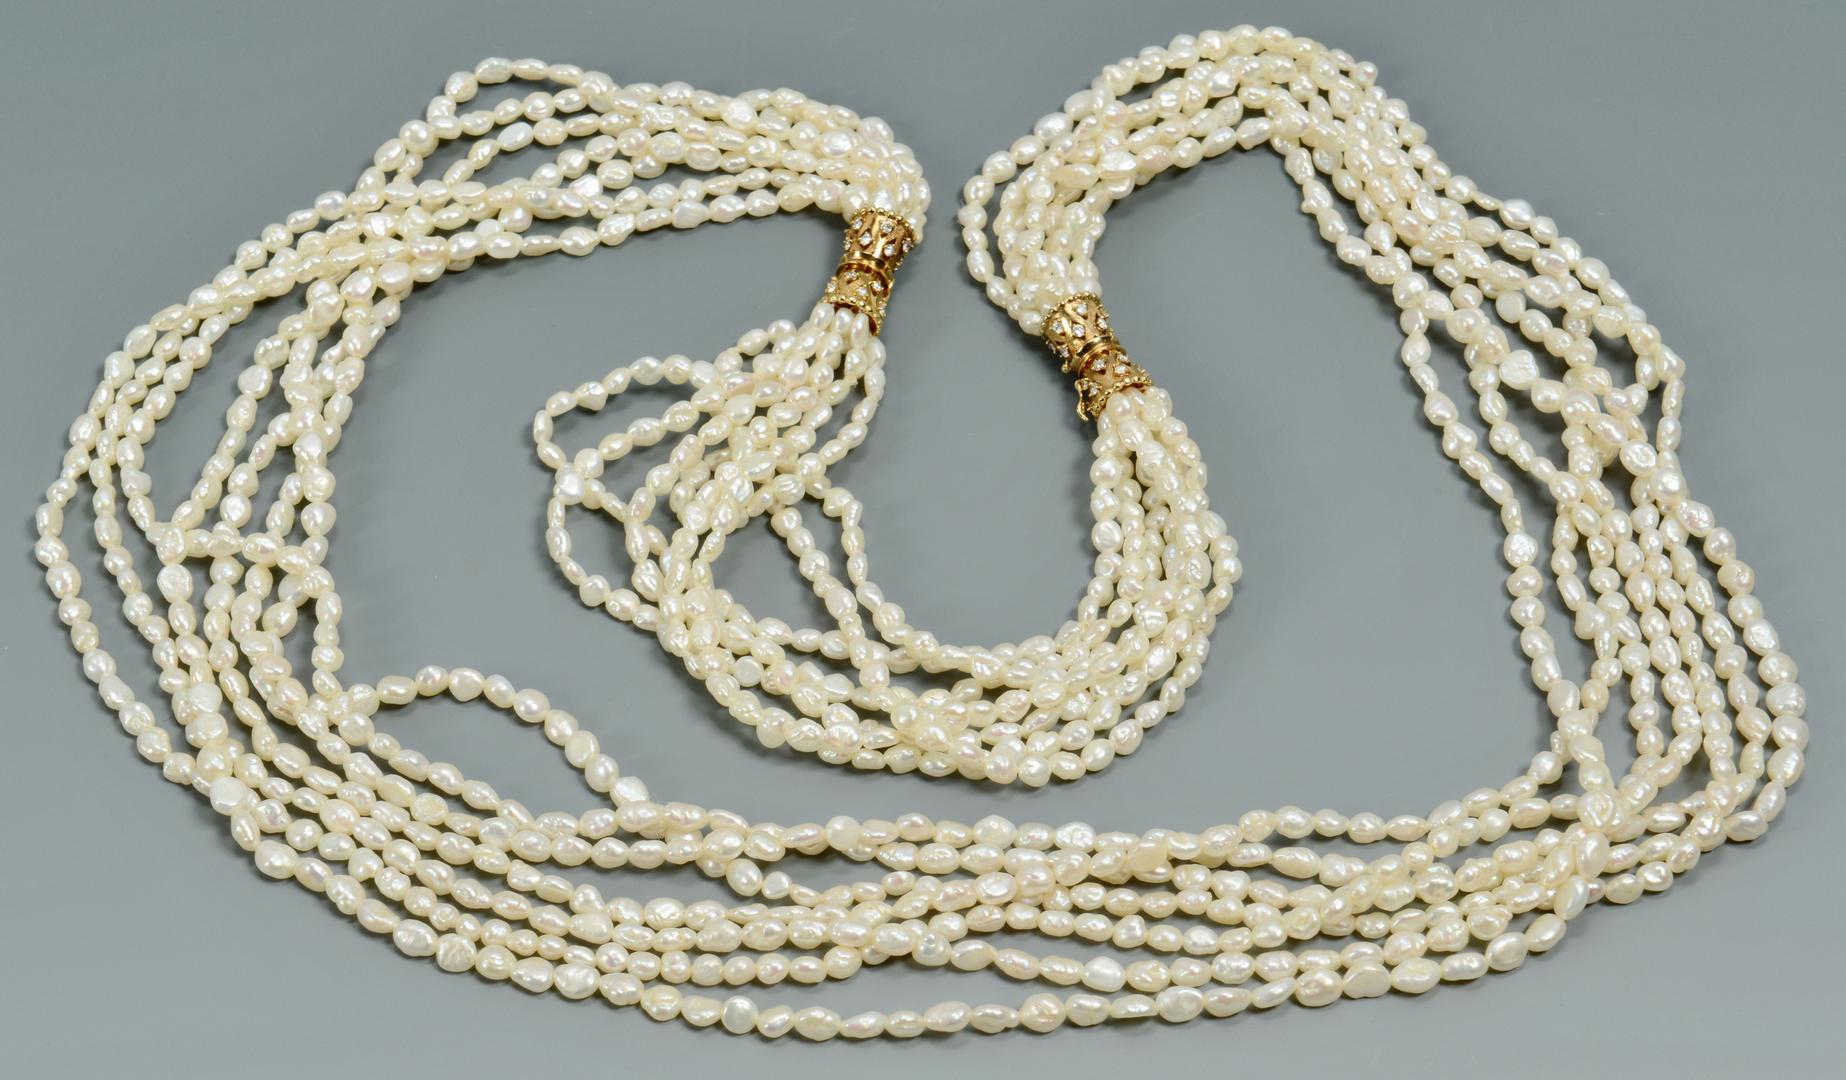 Lot 3088072: 18k Dia Freshwater Pearl Necklace/Bracelet combo